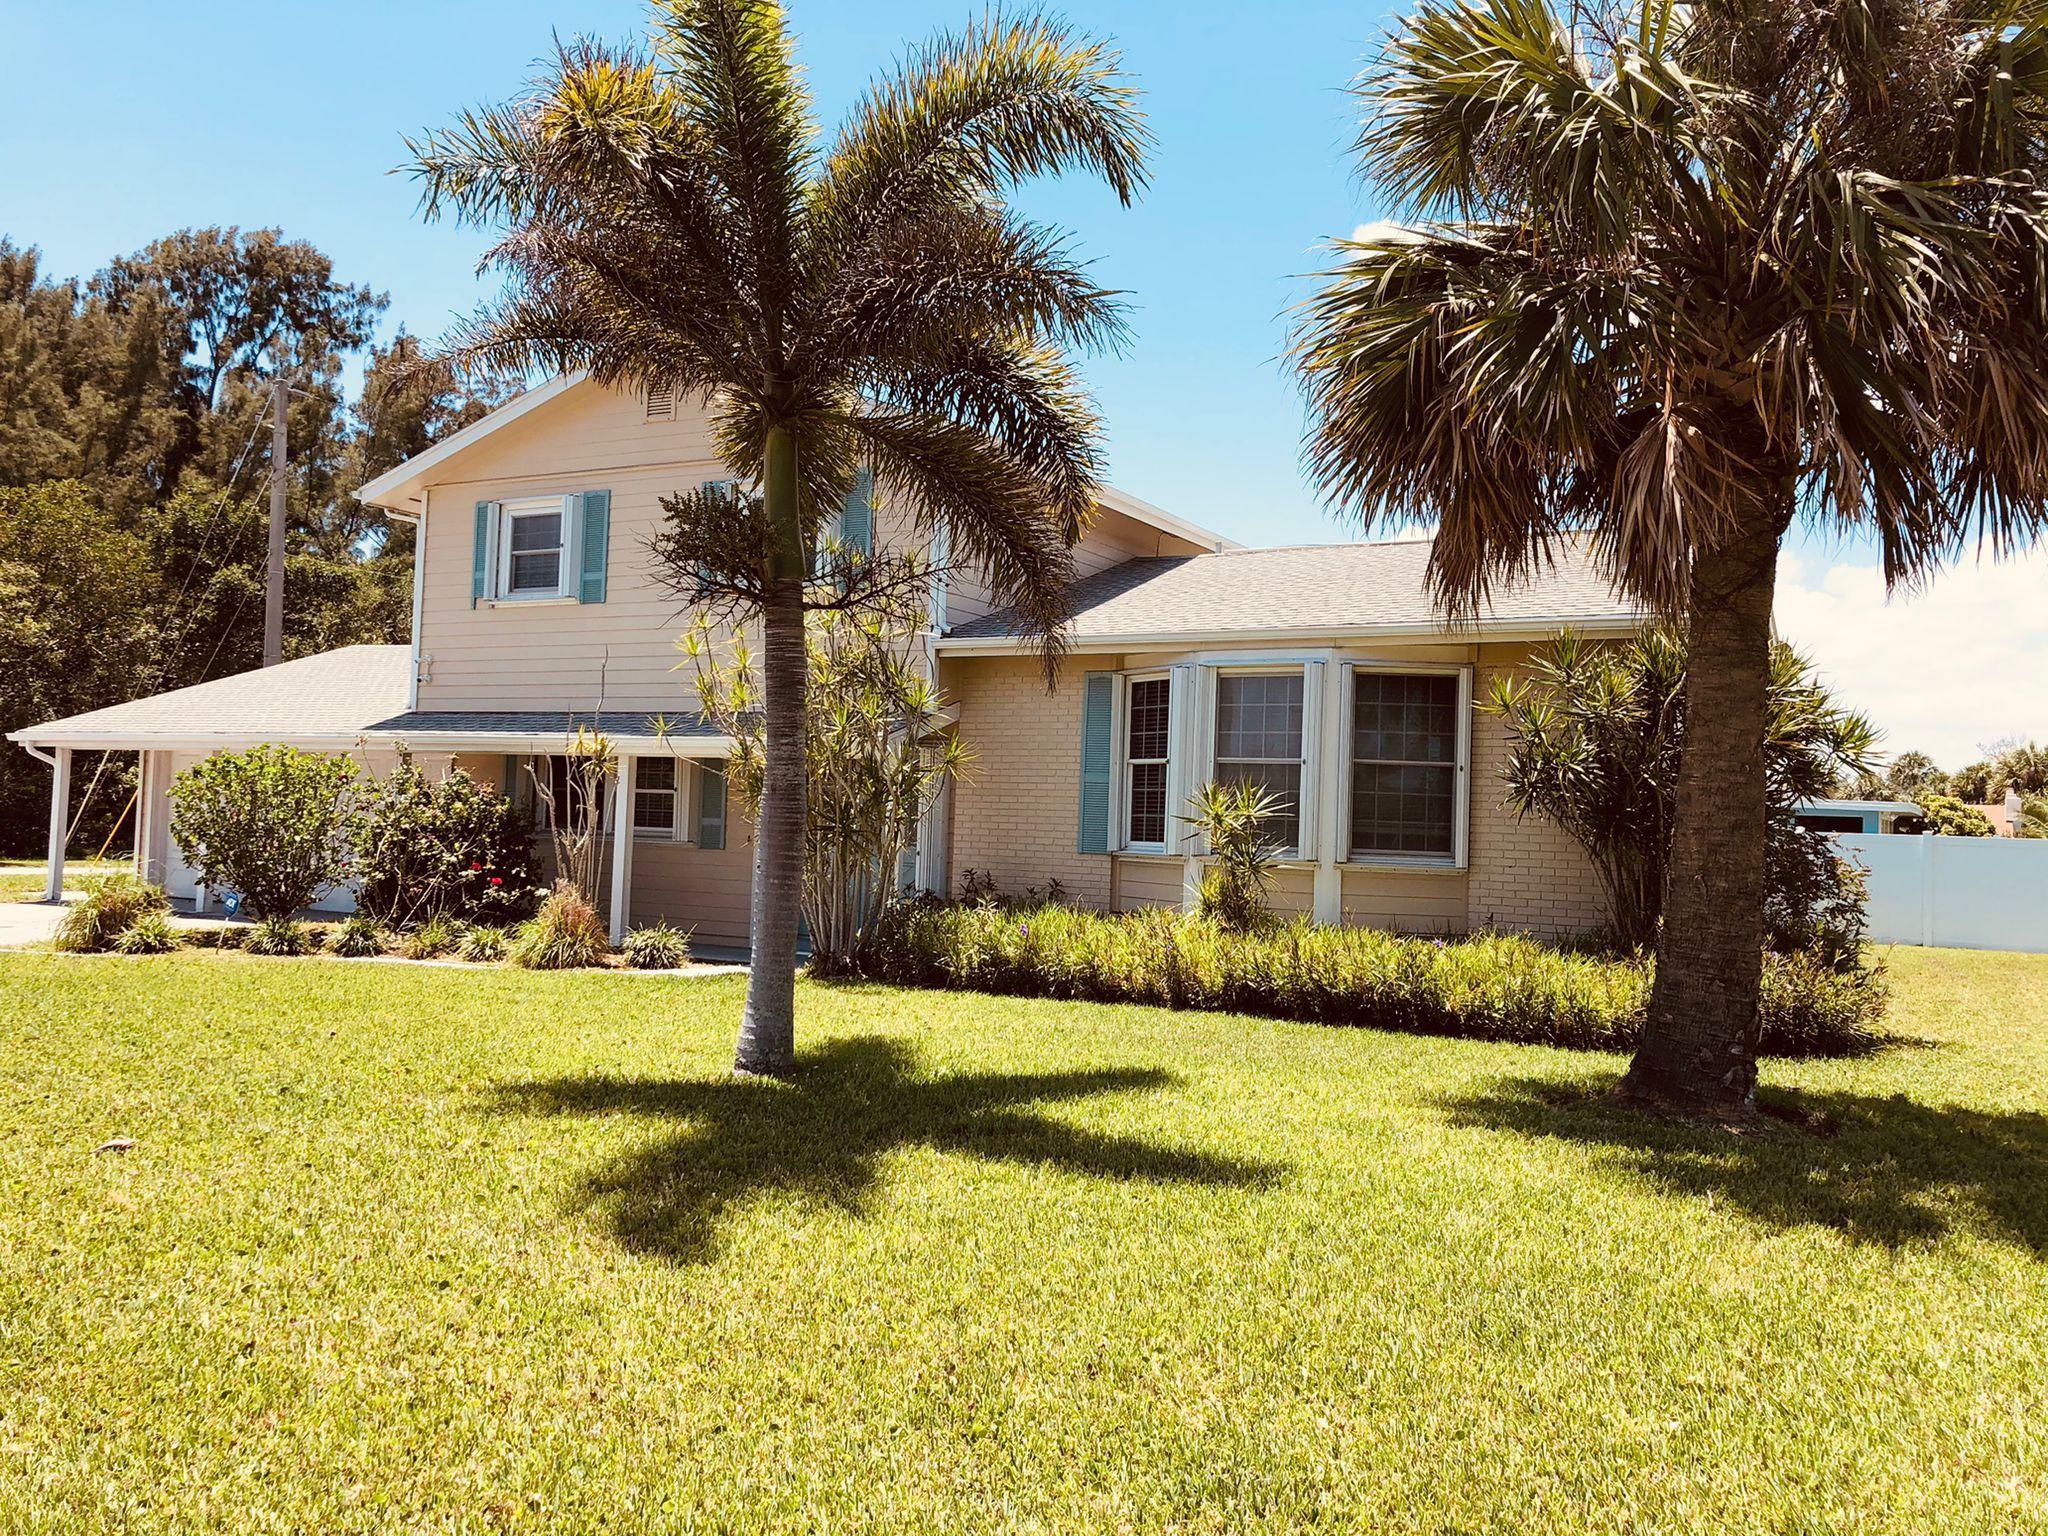 2025 S Ocean Drive, Fort Pierce, FL 34949